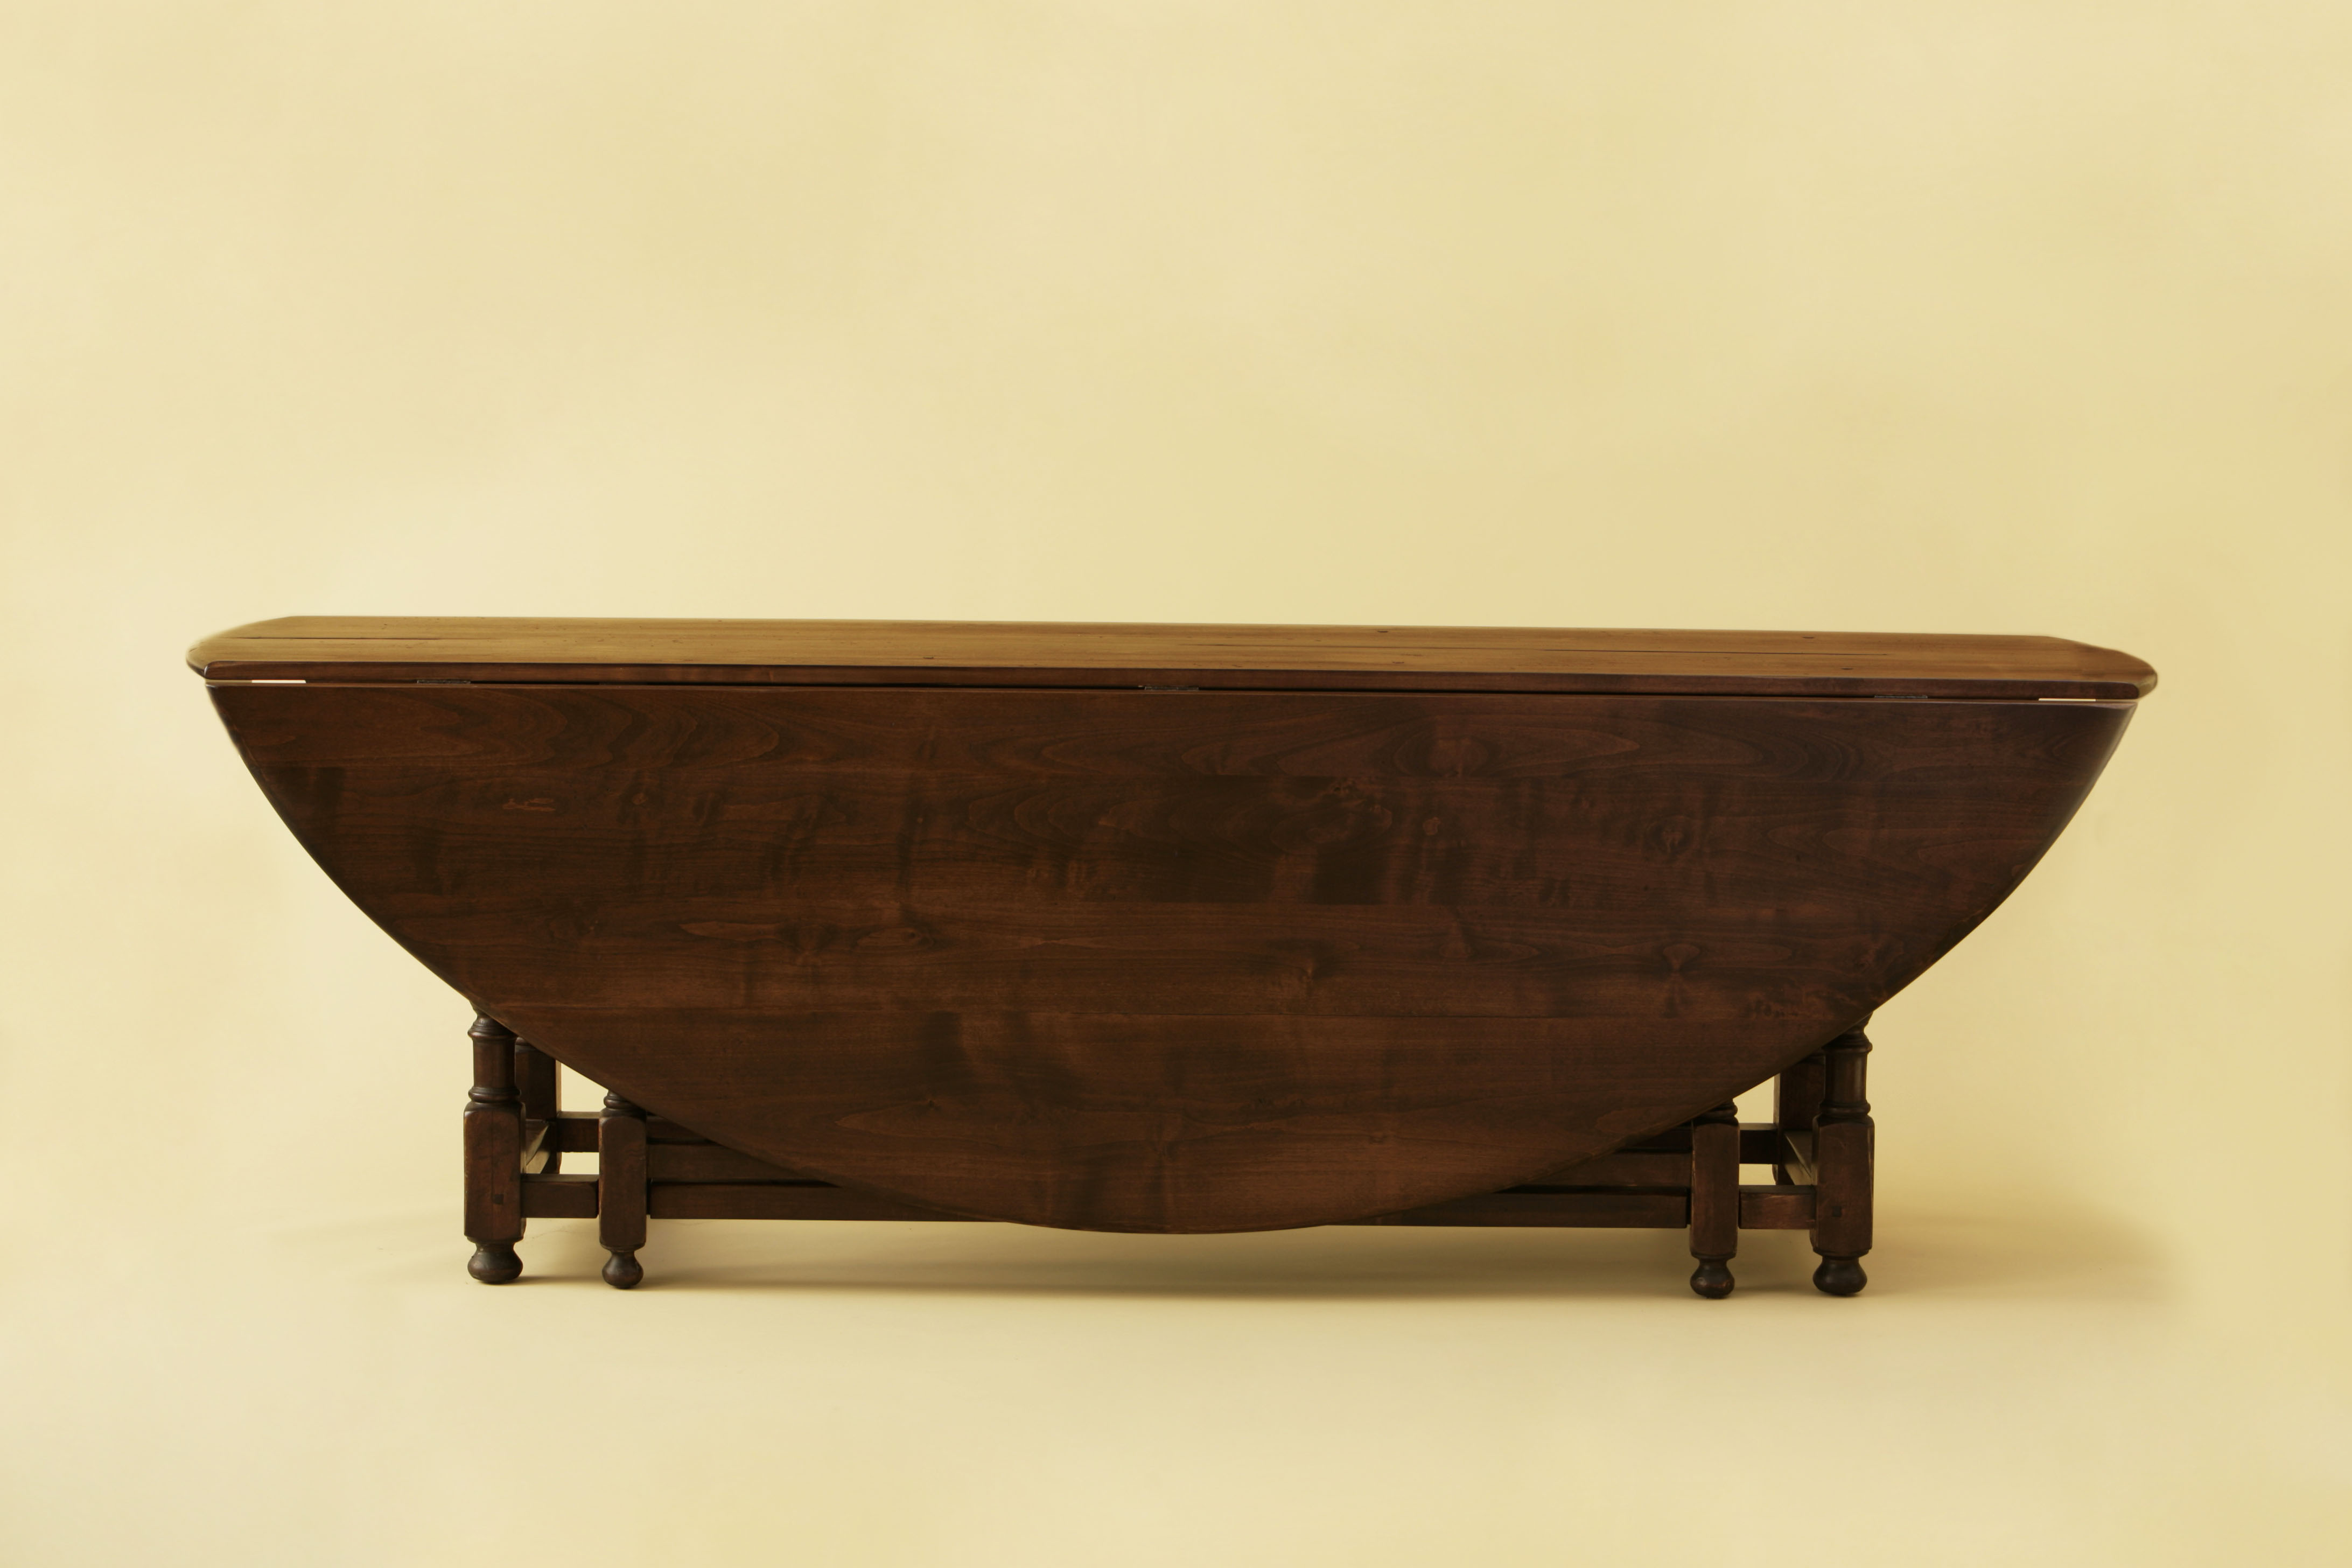 Oval Gateleg Table